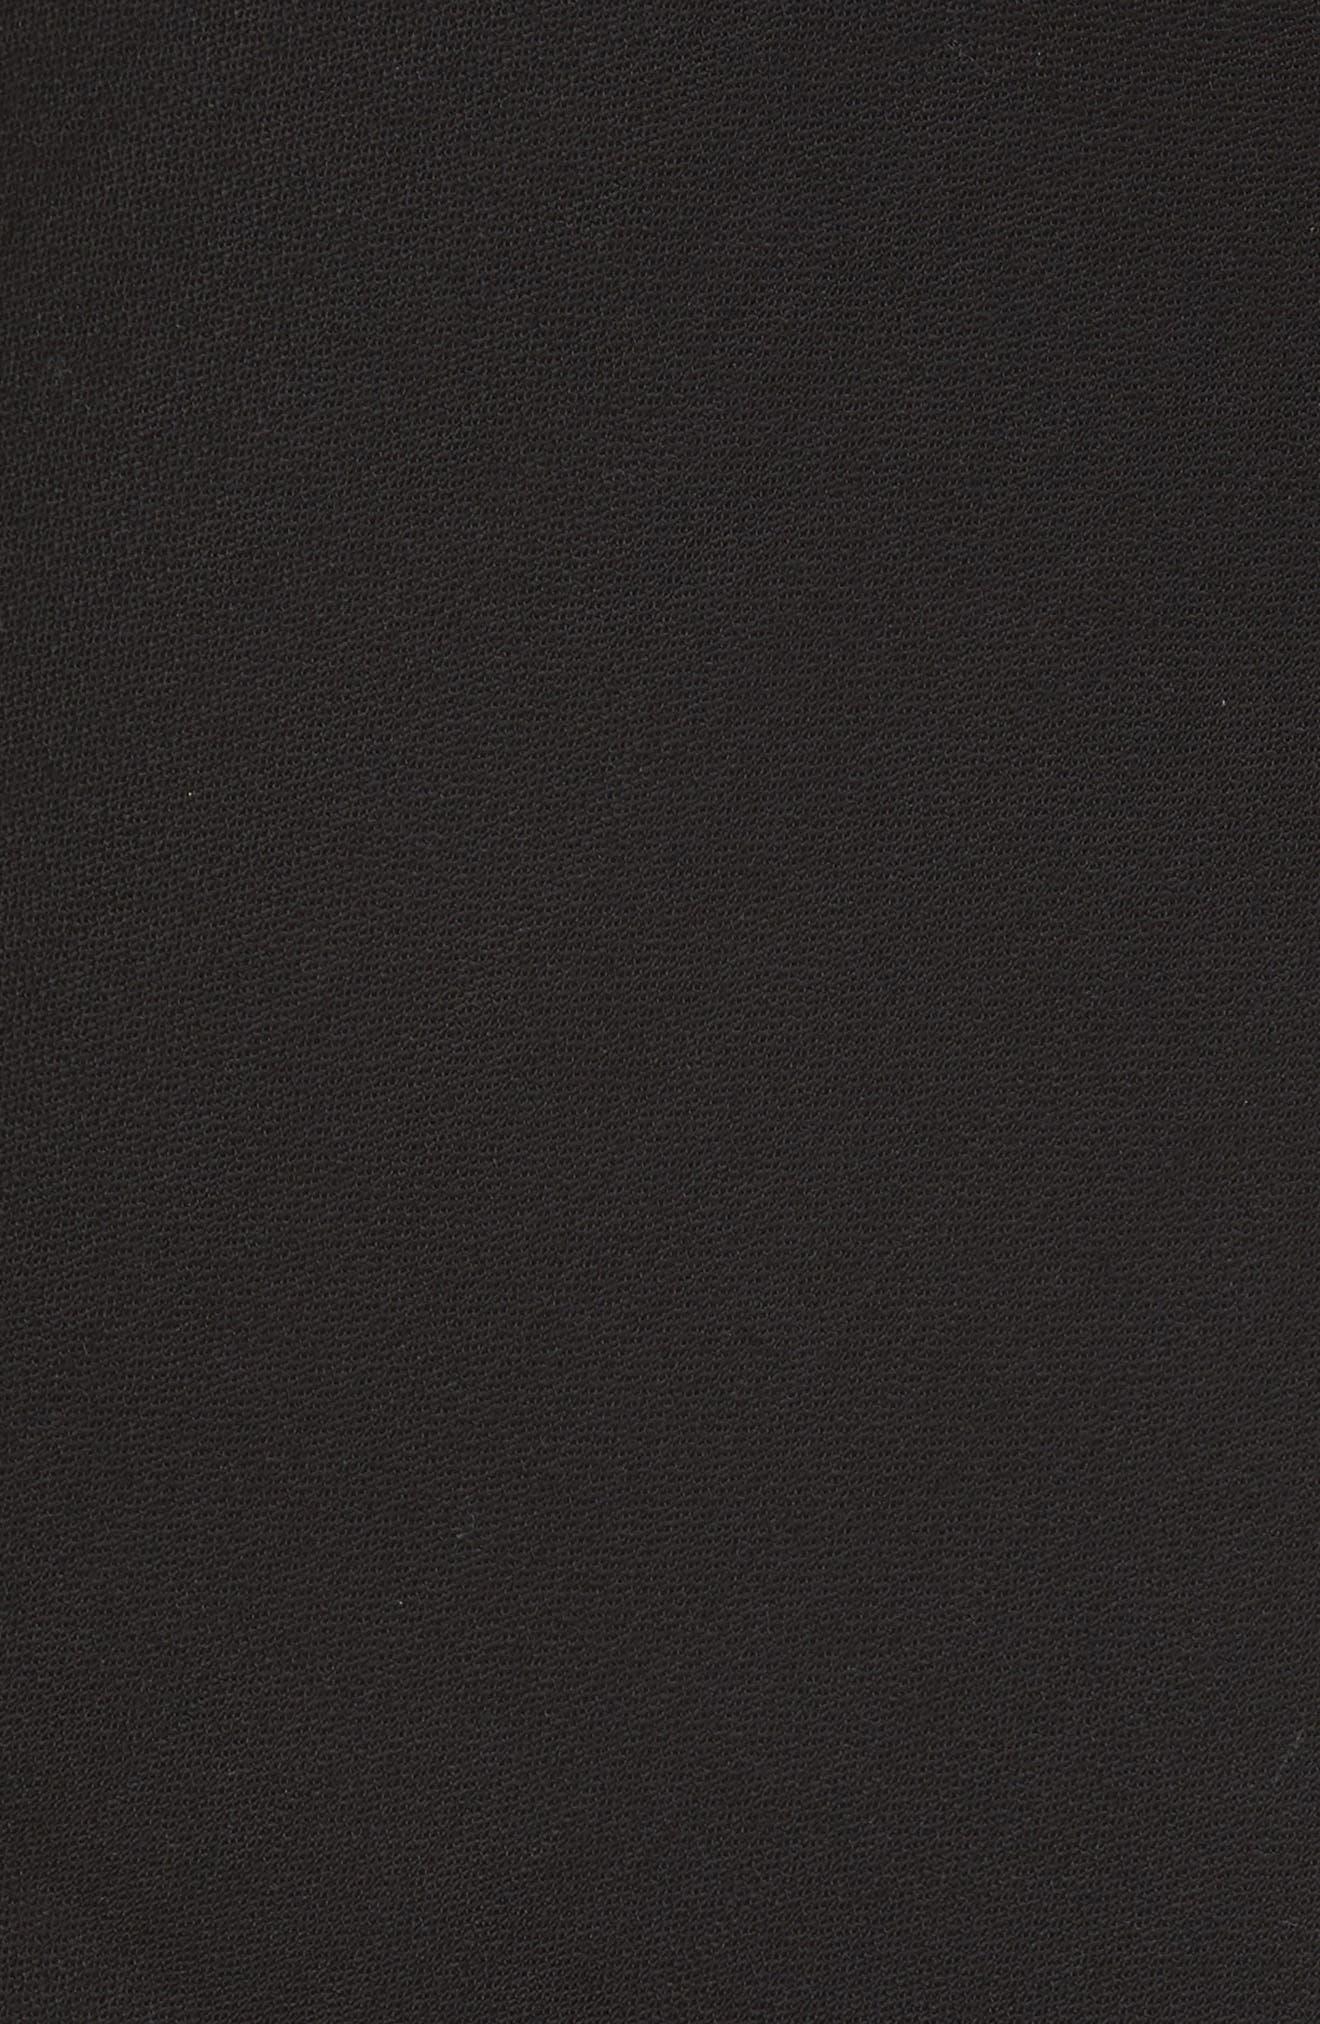 Ruffle Neck Asymmetrical Dress,                             Alternate thumbnail 5, color,                             BLACK